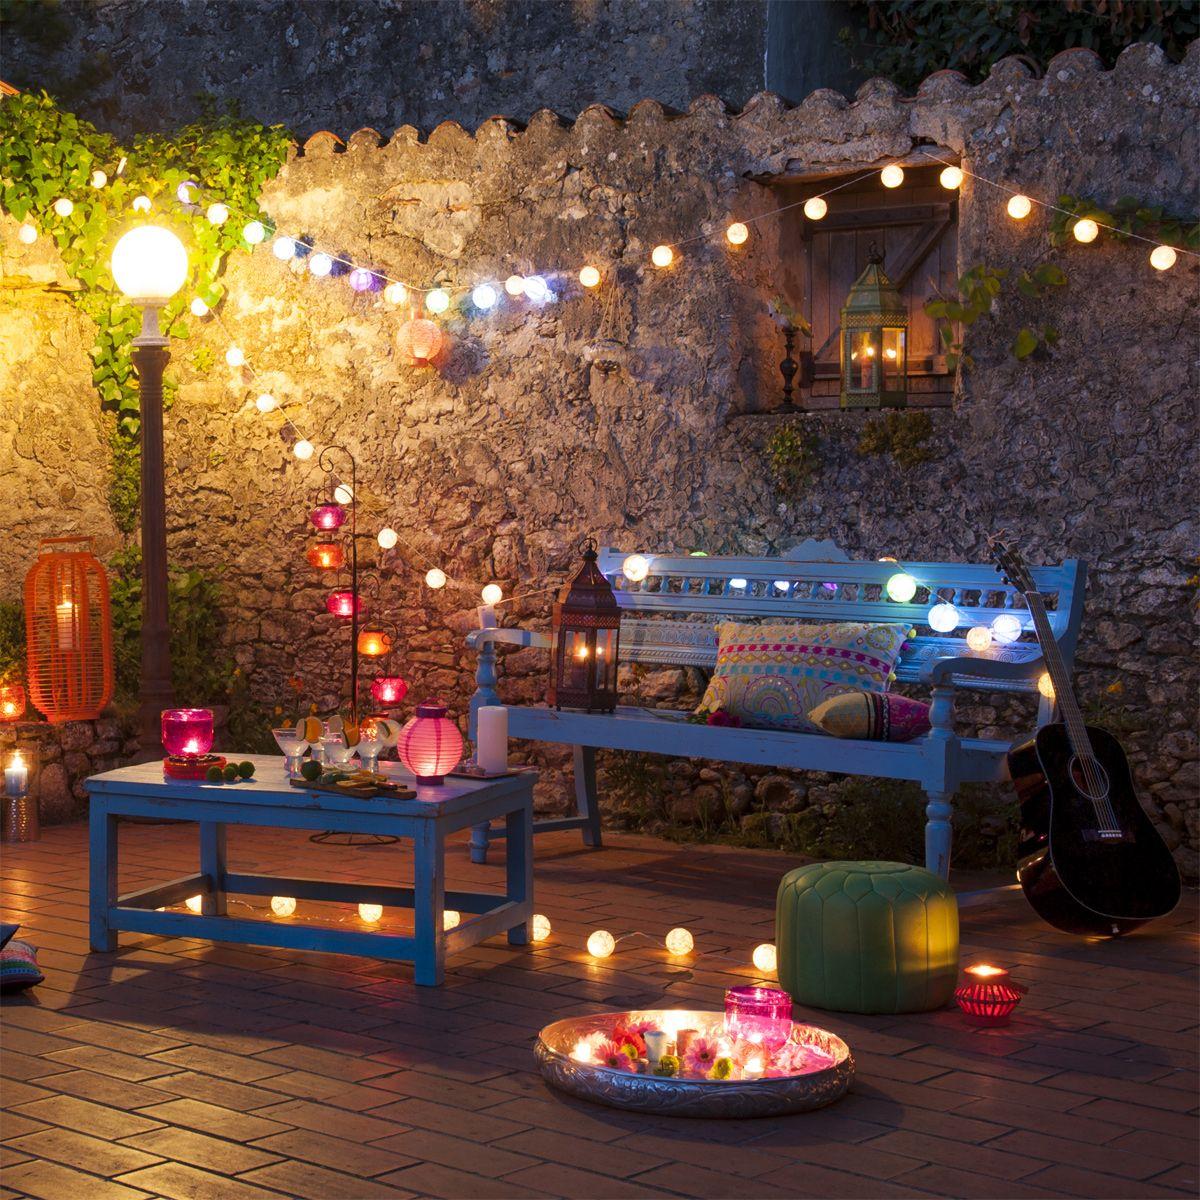 farol marbella exterior design patio terrace backyard fairy lights romantic bohemian ms